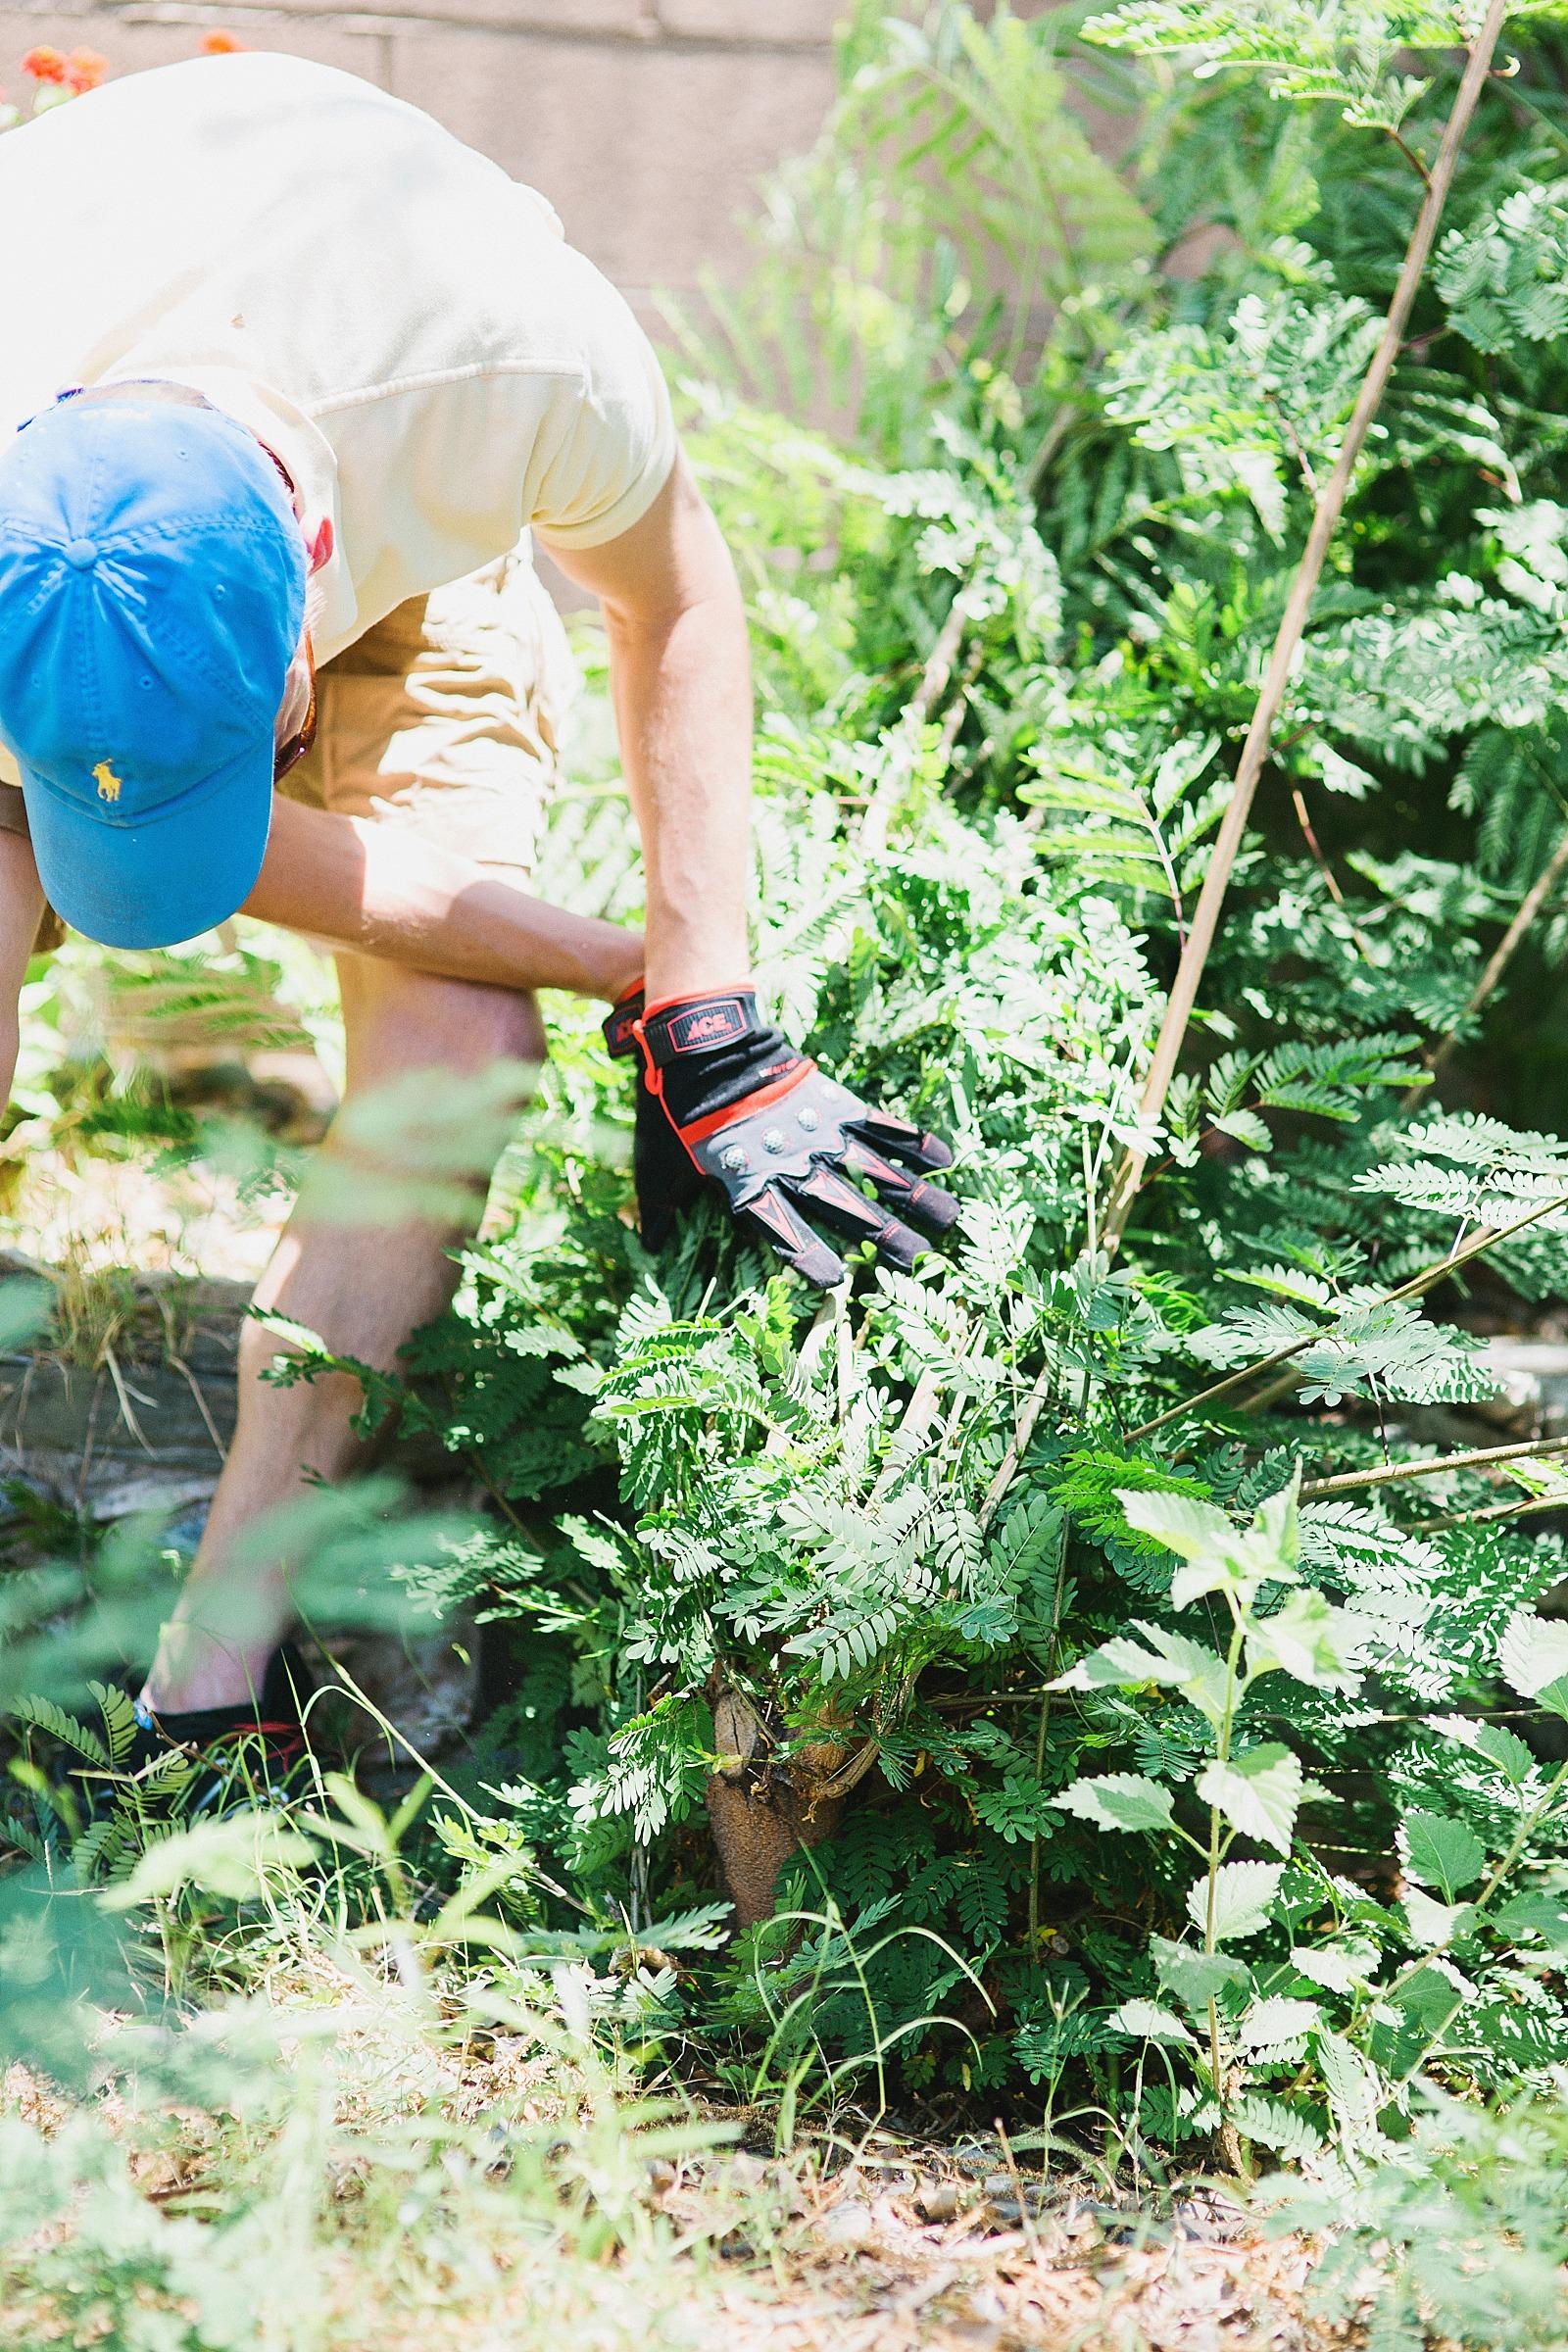 worx-chain-saw-review-gardening-blogger-home-diana-elizabeth-116a